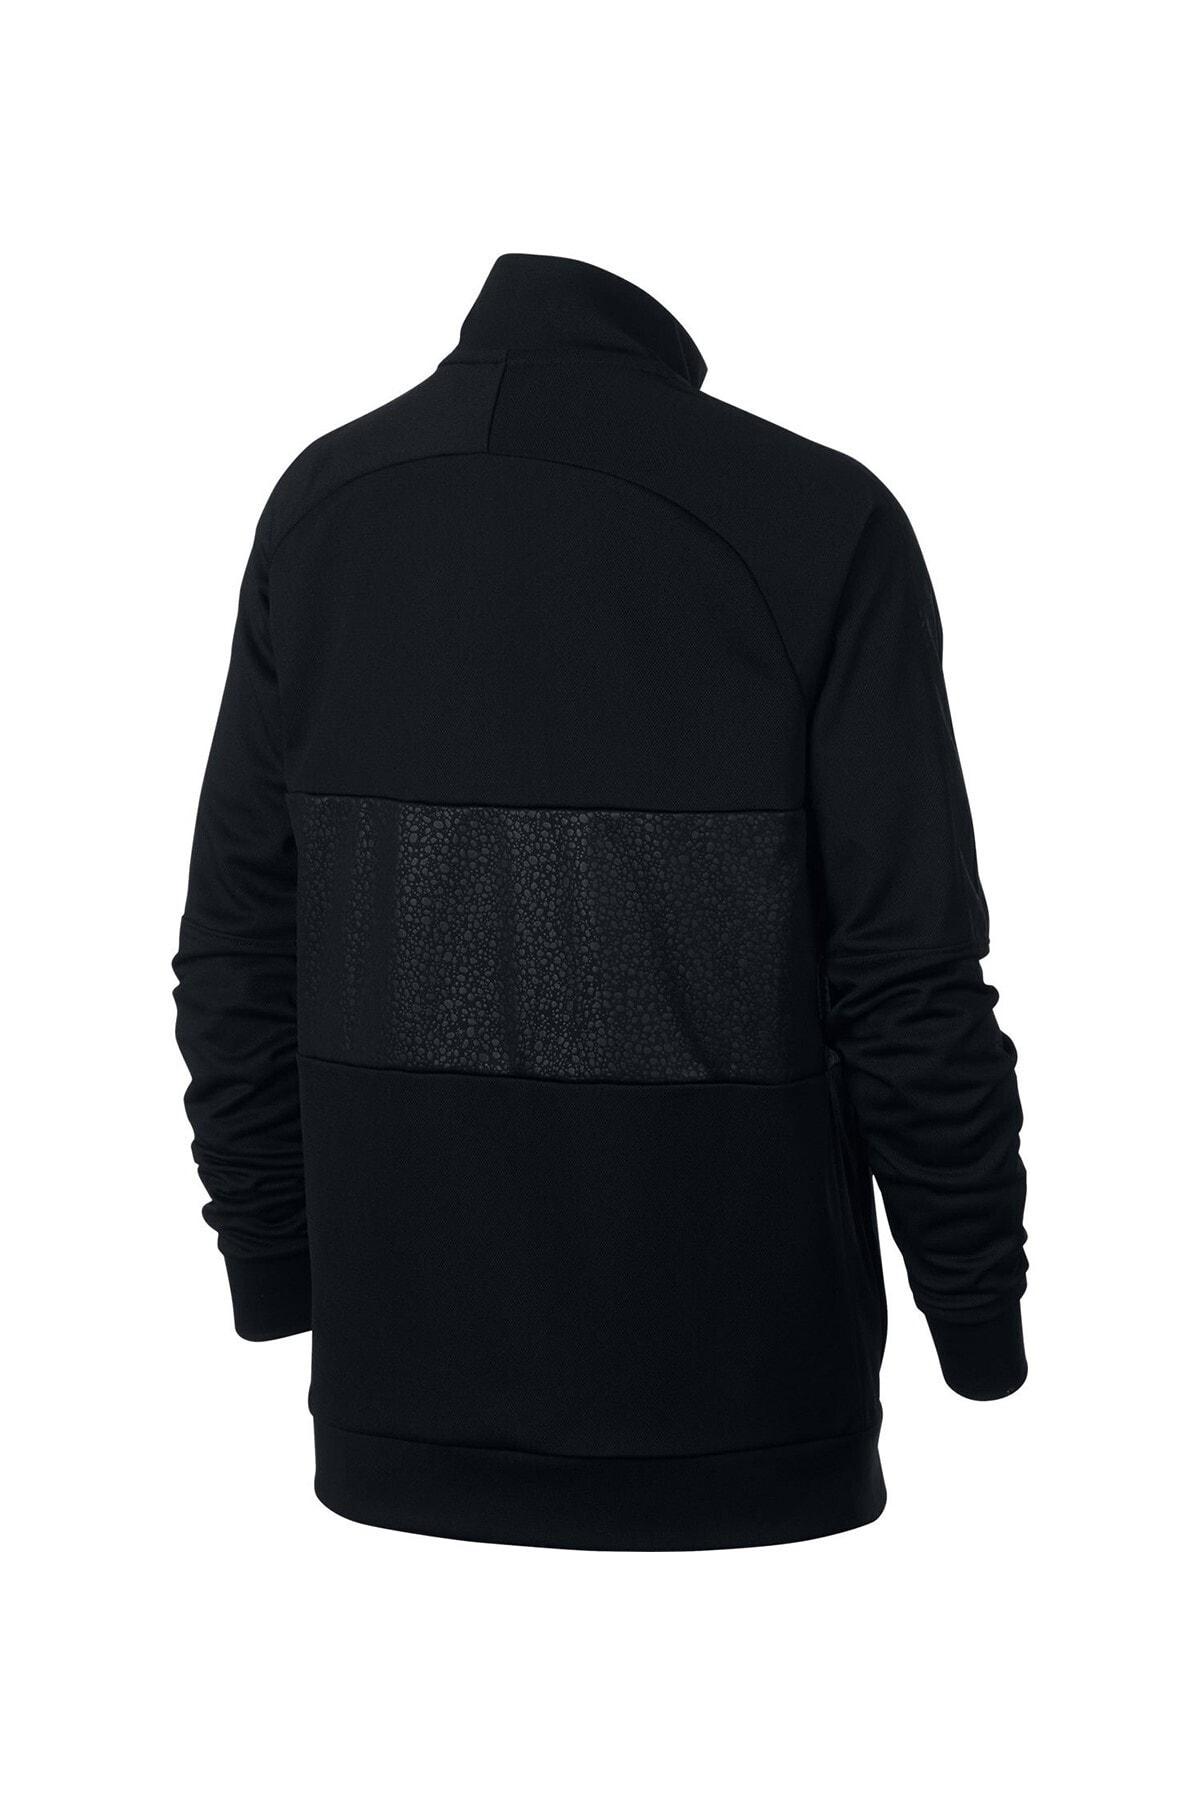 Nike Çocuk Siyah Mercurial B Dry Trk Jkt I96 Sweatshirt Aq3314-010